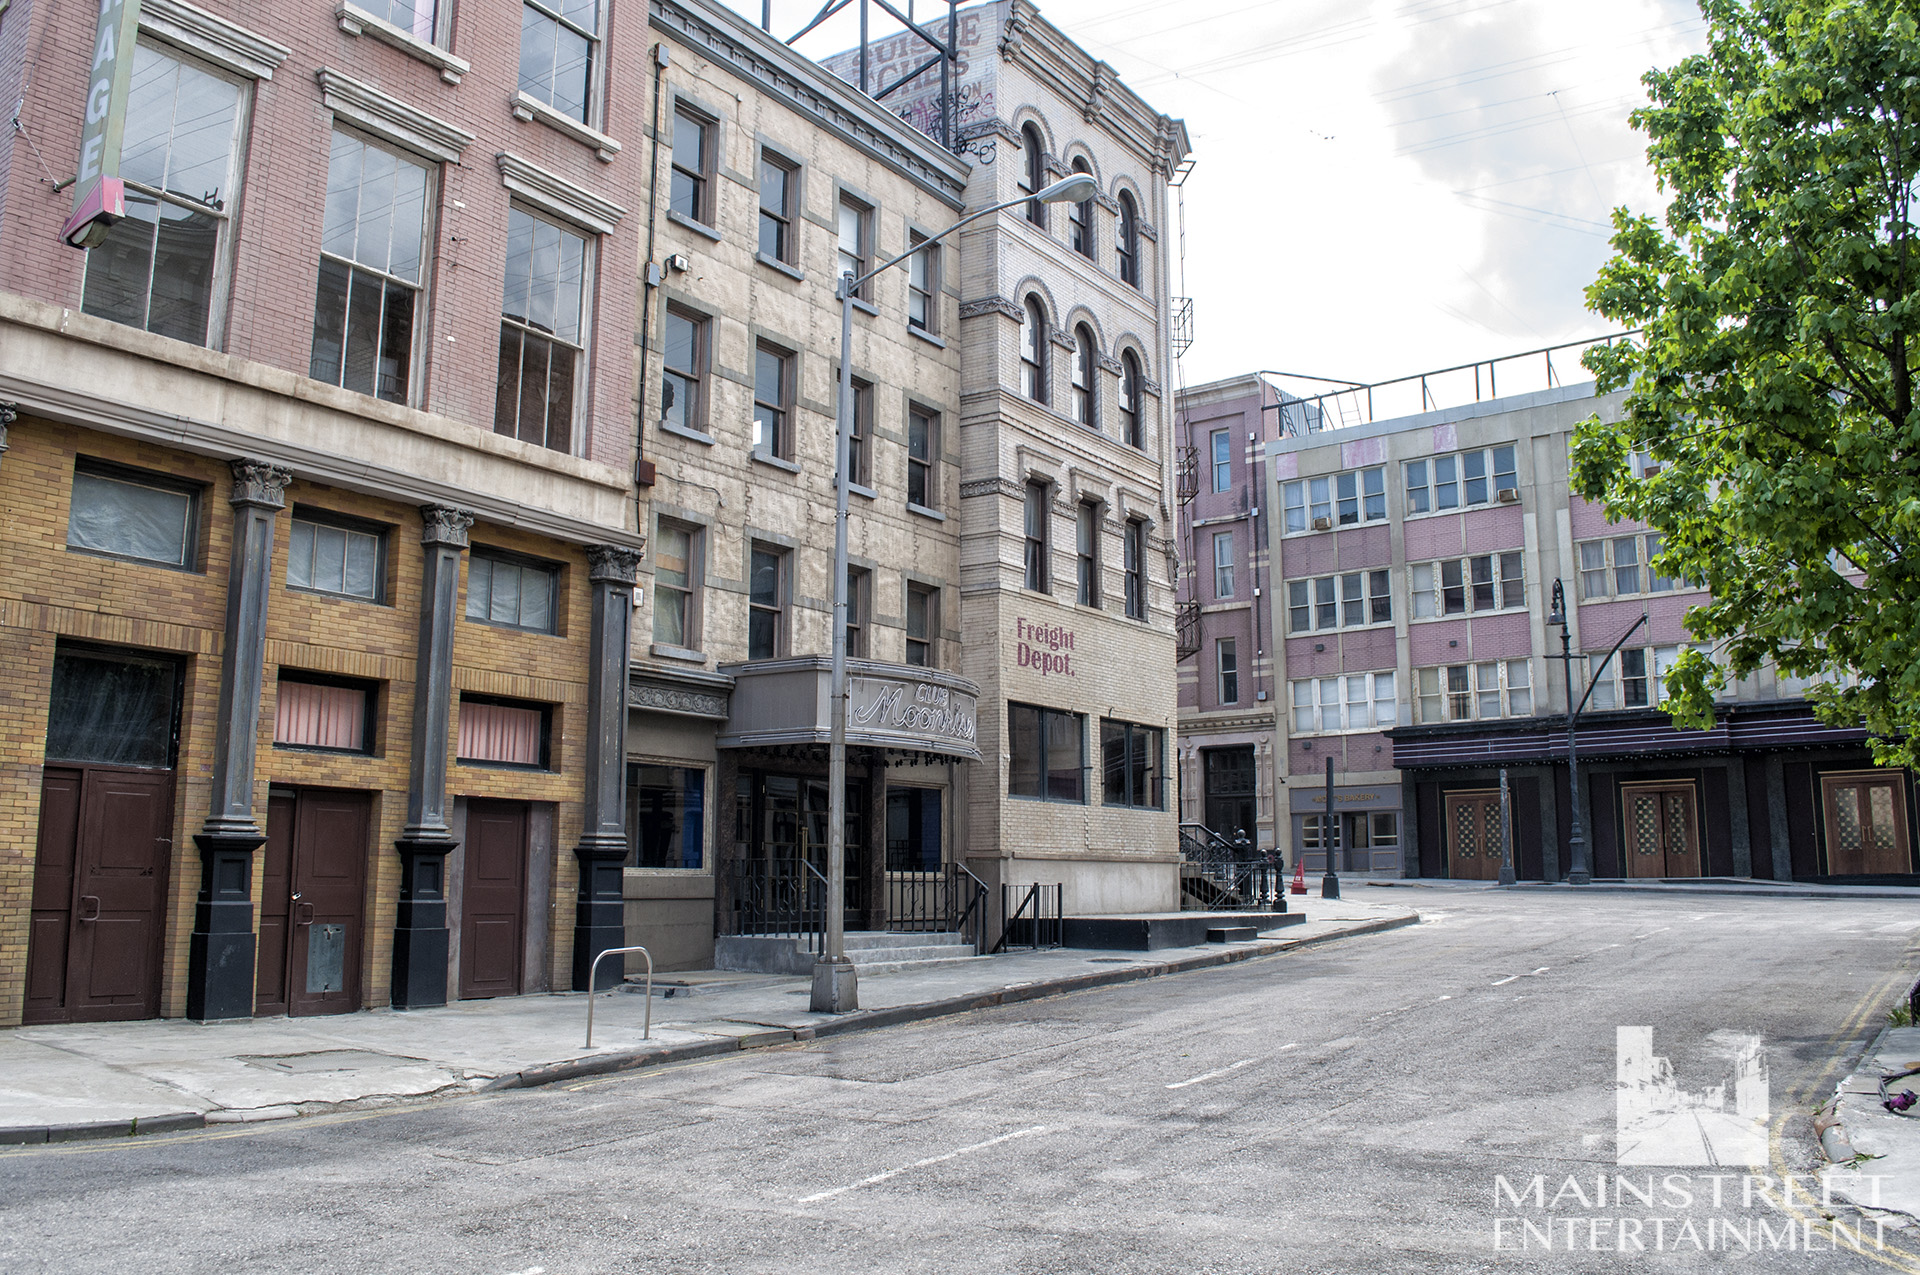 New York streets movie set